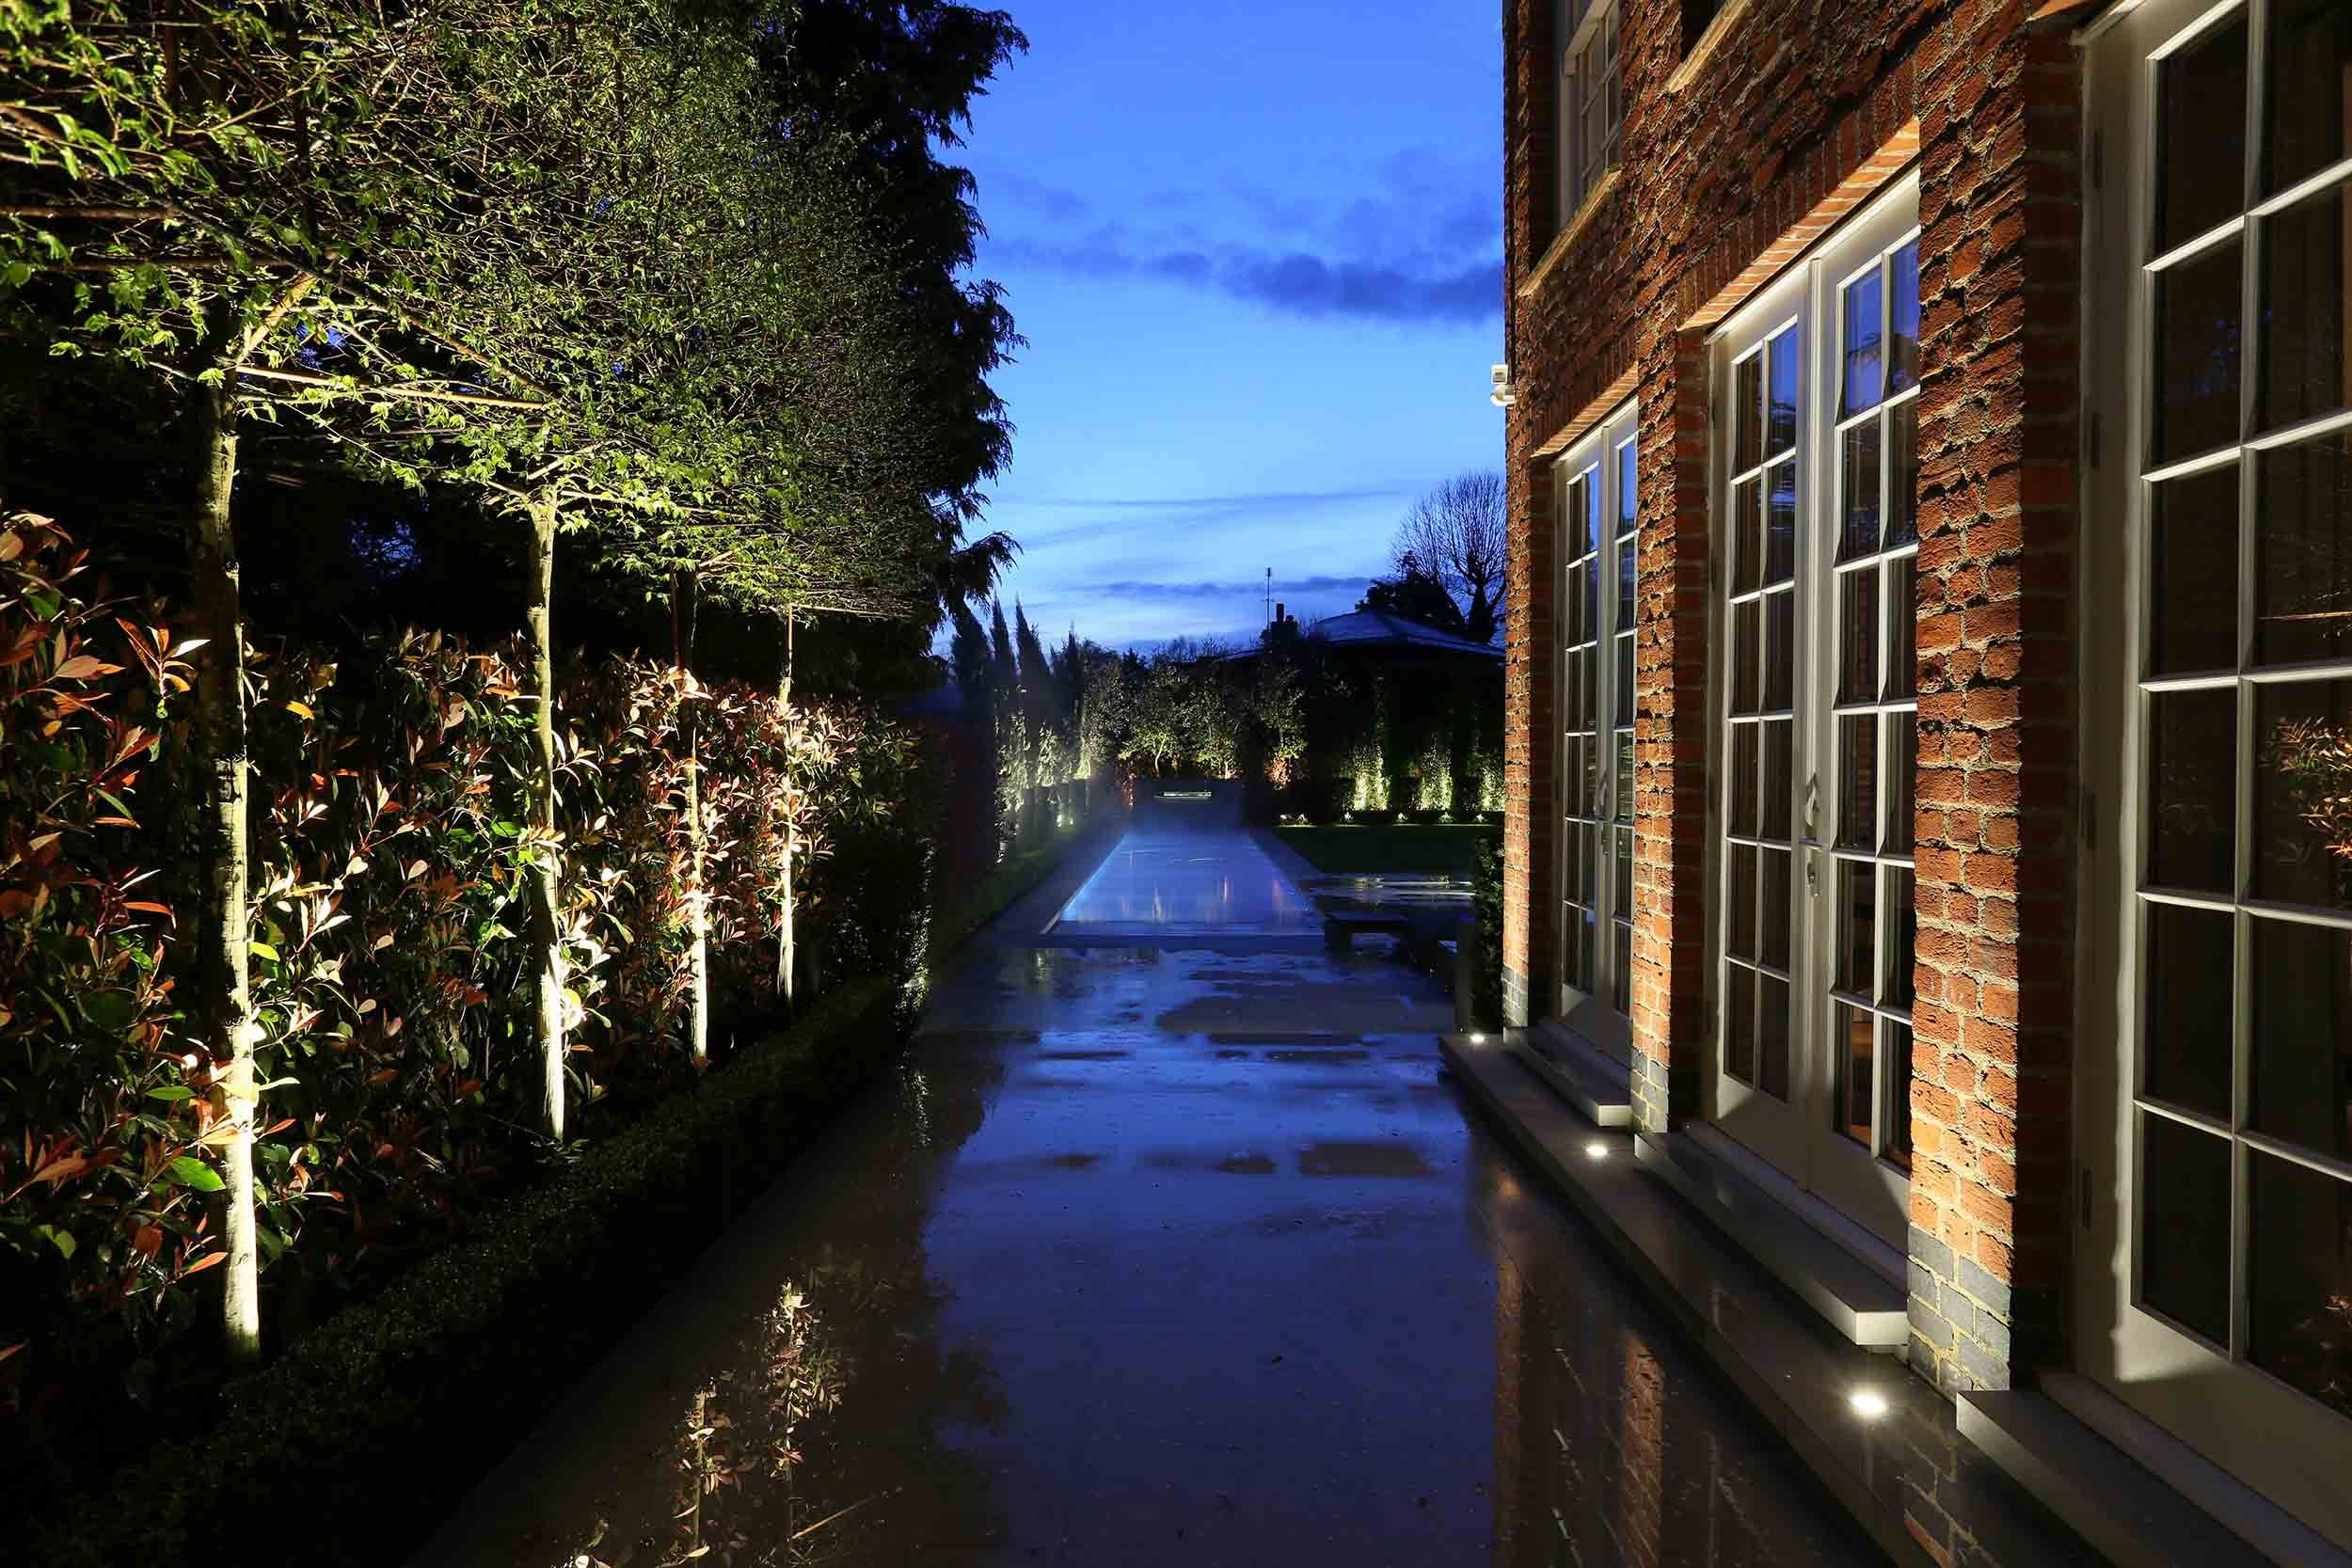 Designer Lighting Makes London Garden Glow